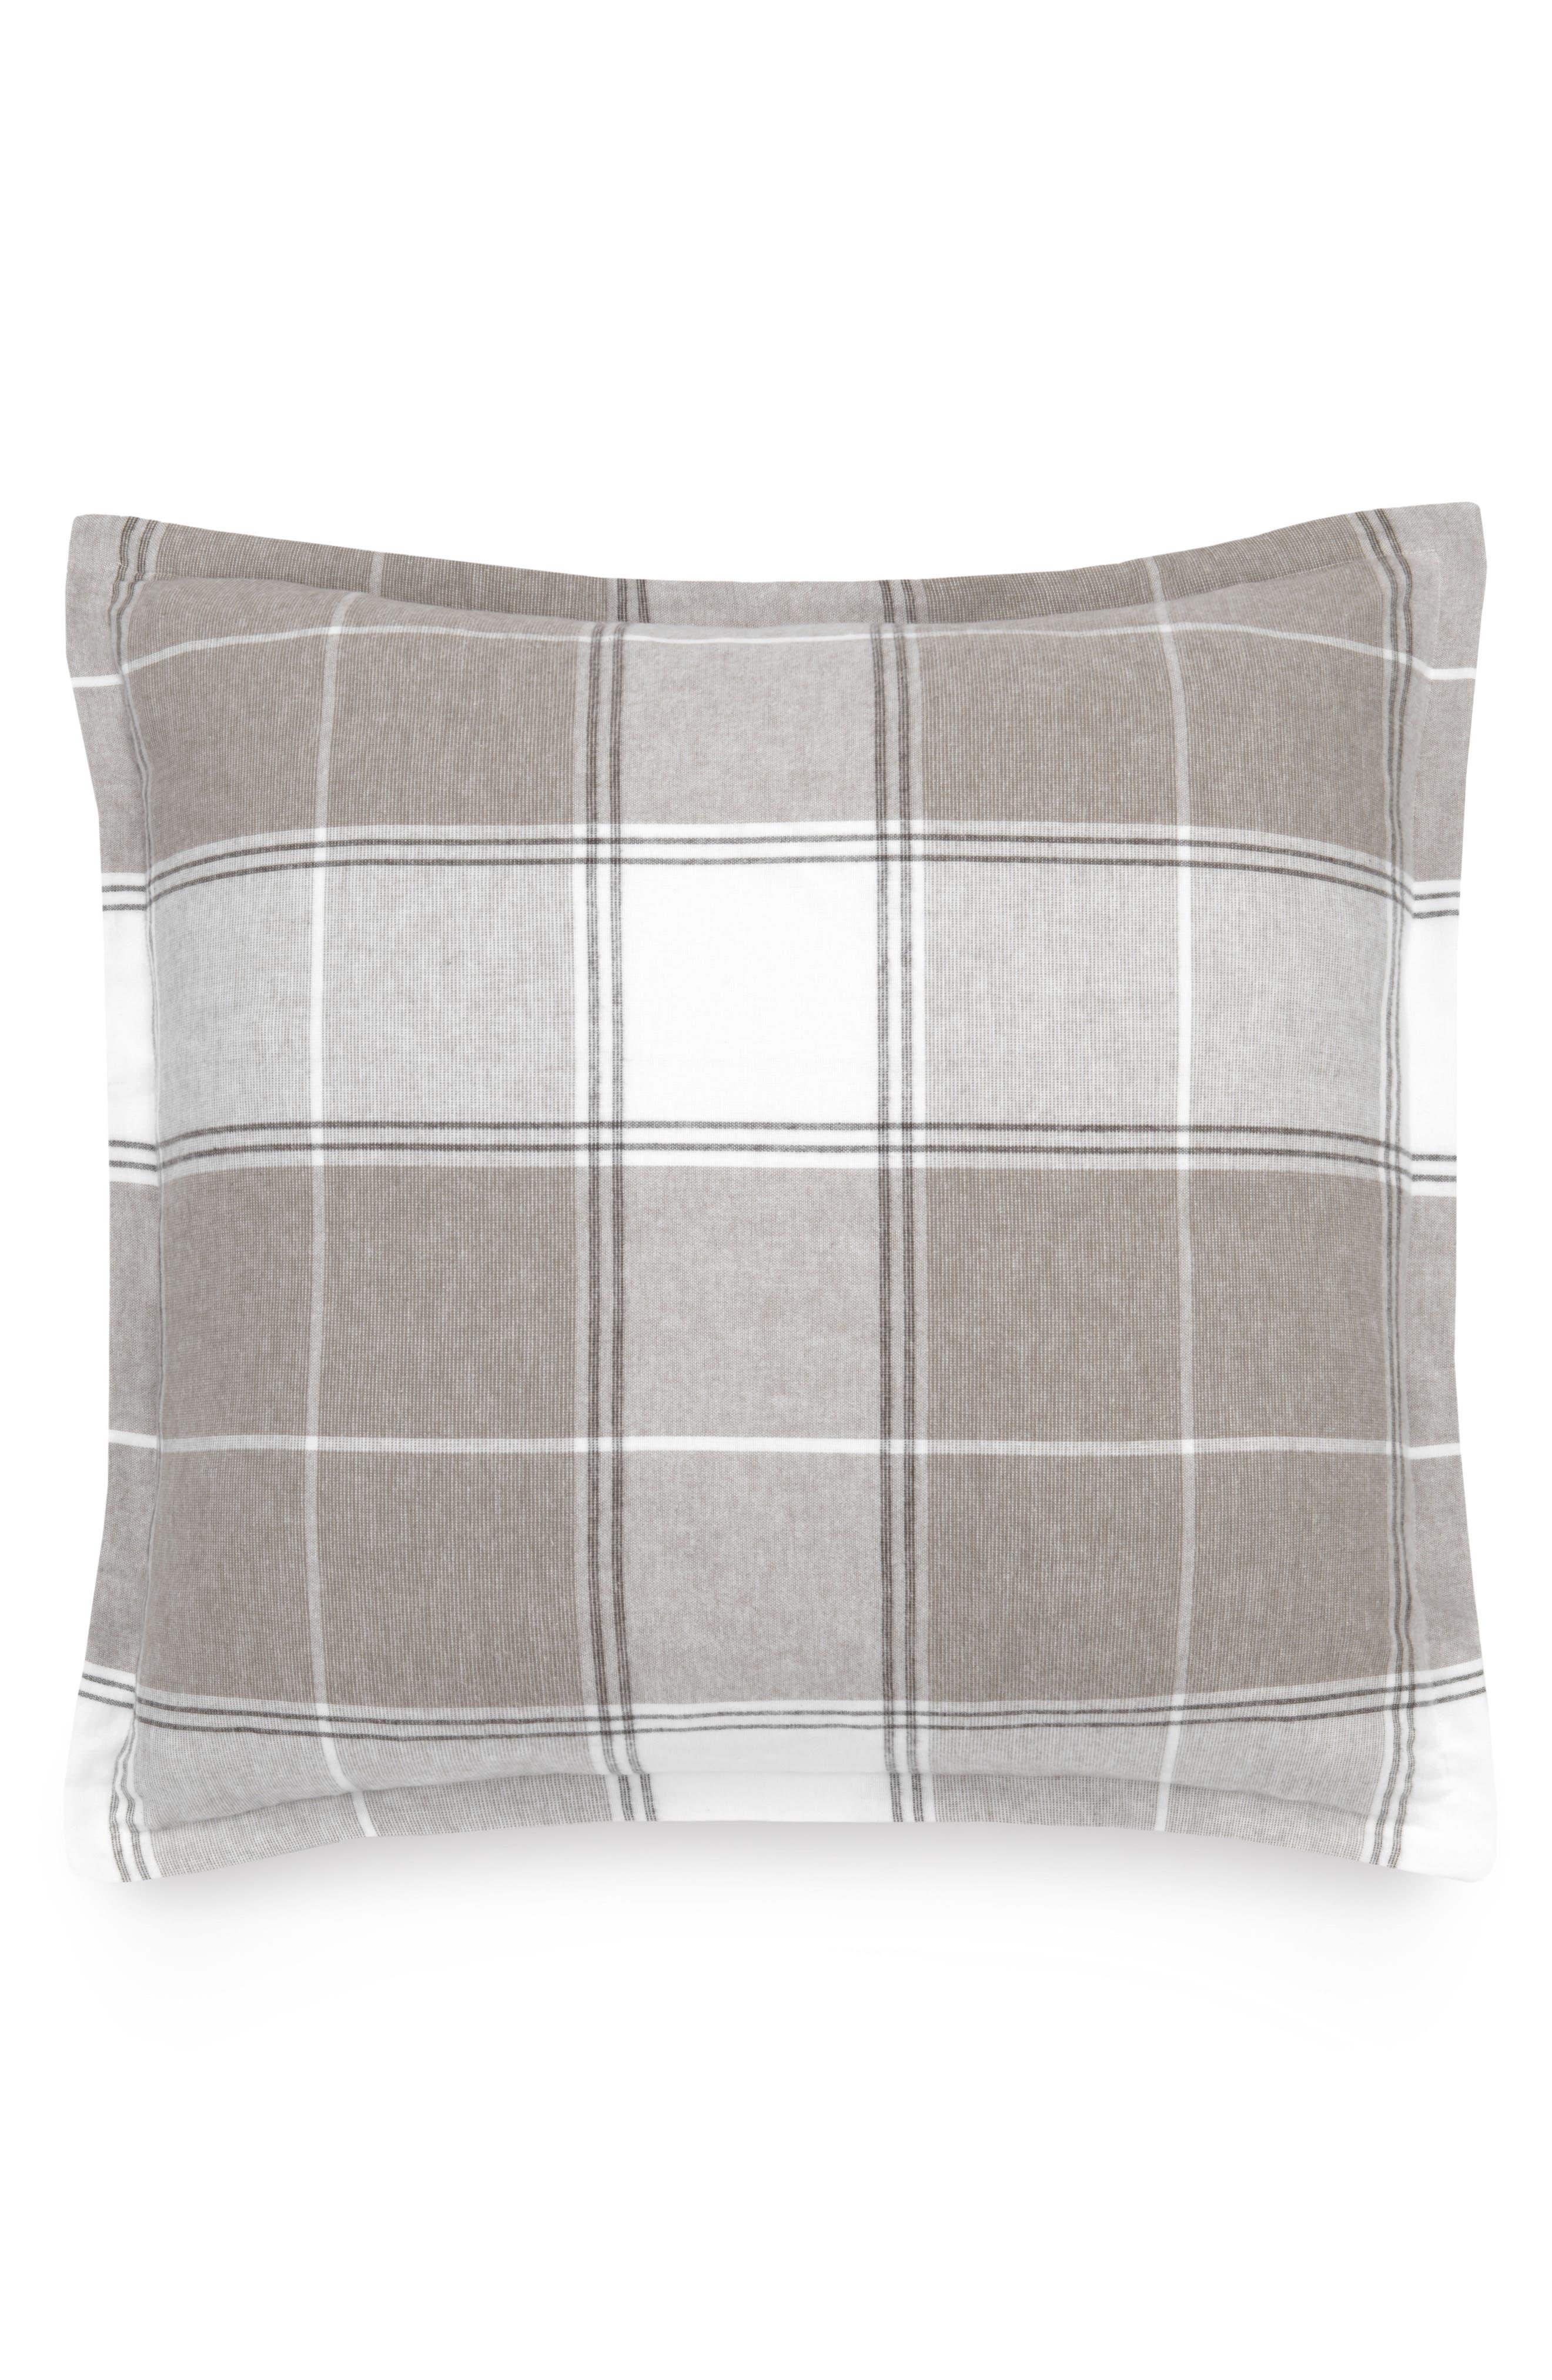 Flannel Luxe Euro Sham,                         Main,                         color, Doeskin Multi